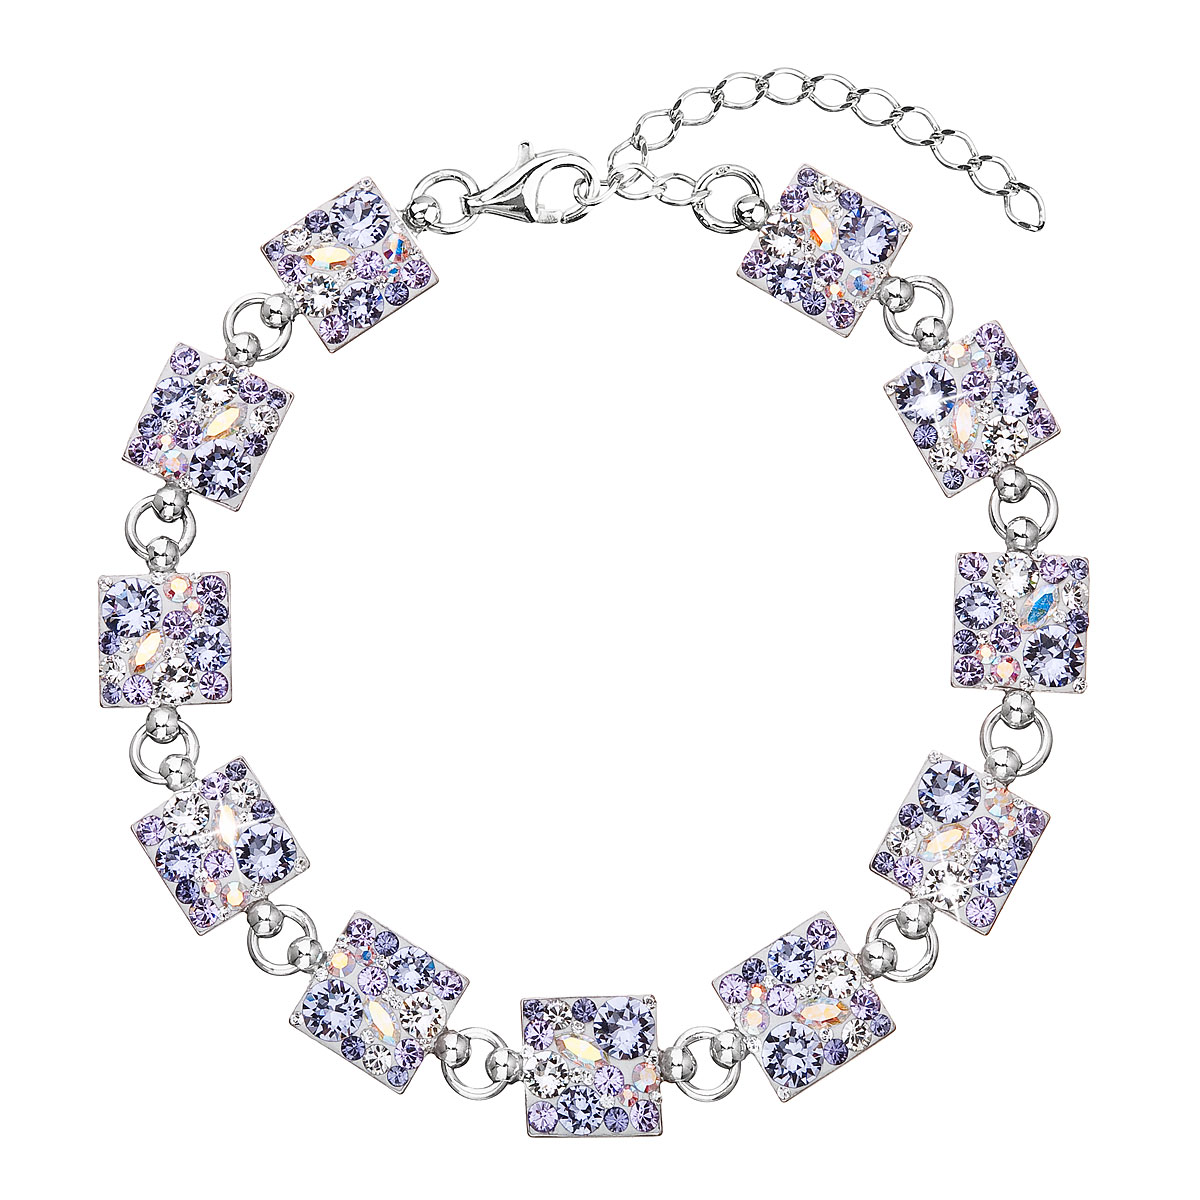 Evolution Group Stříbrný náramek se Swarovski krystaly fialový 33047.3 violet